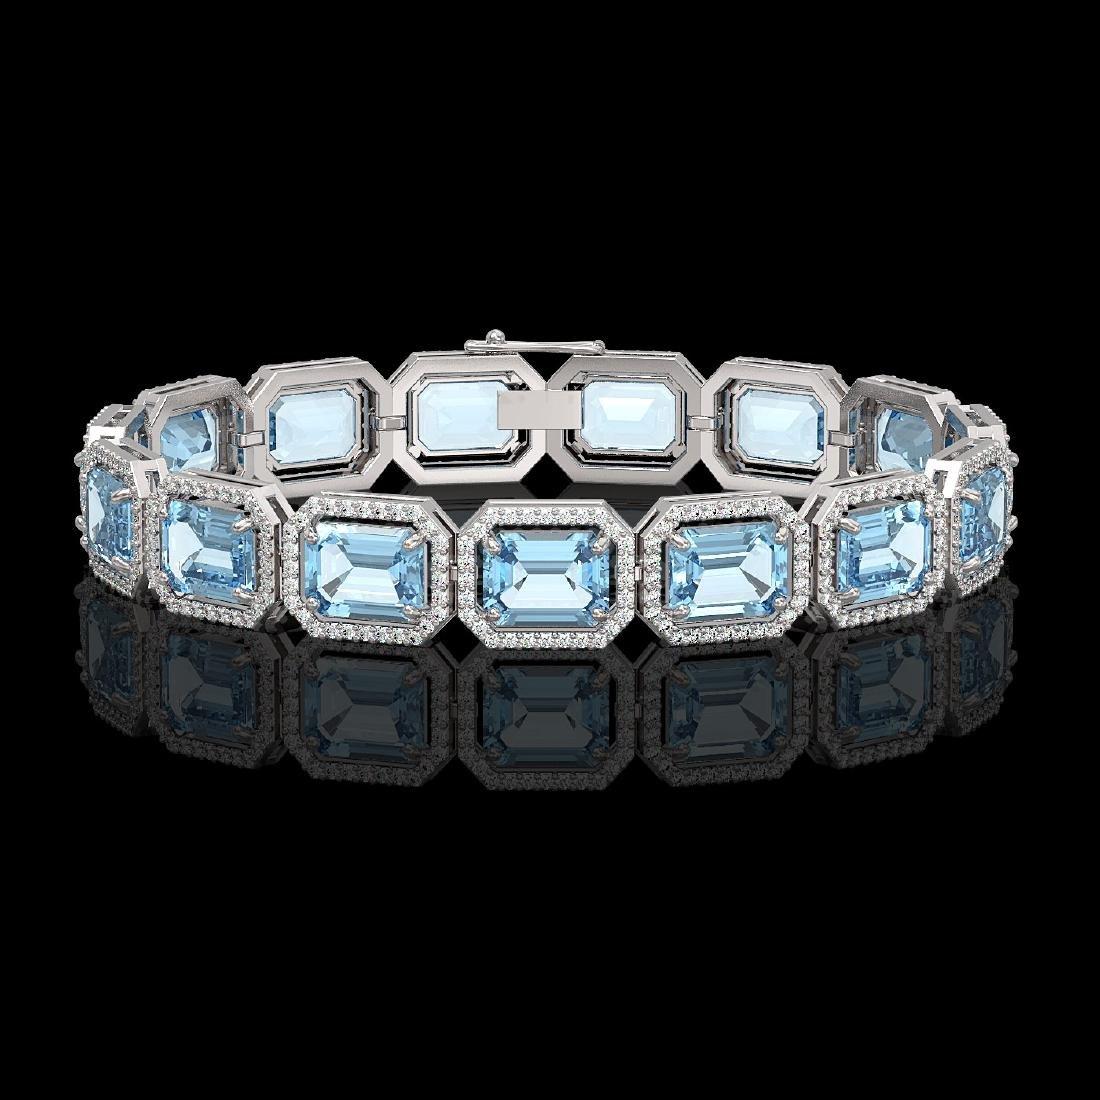 36.81 CTW Aquamarine & Diamond Halo Bracelet 10K White